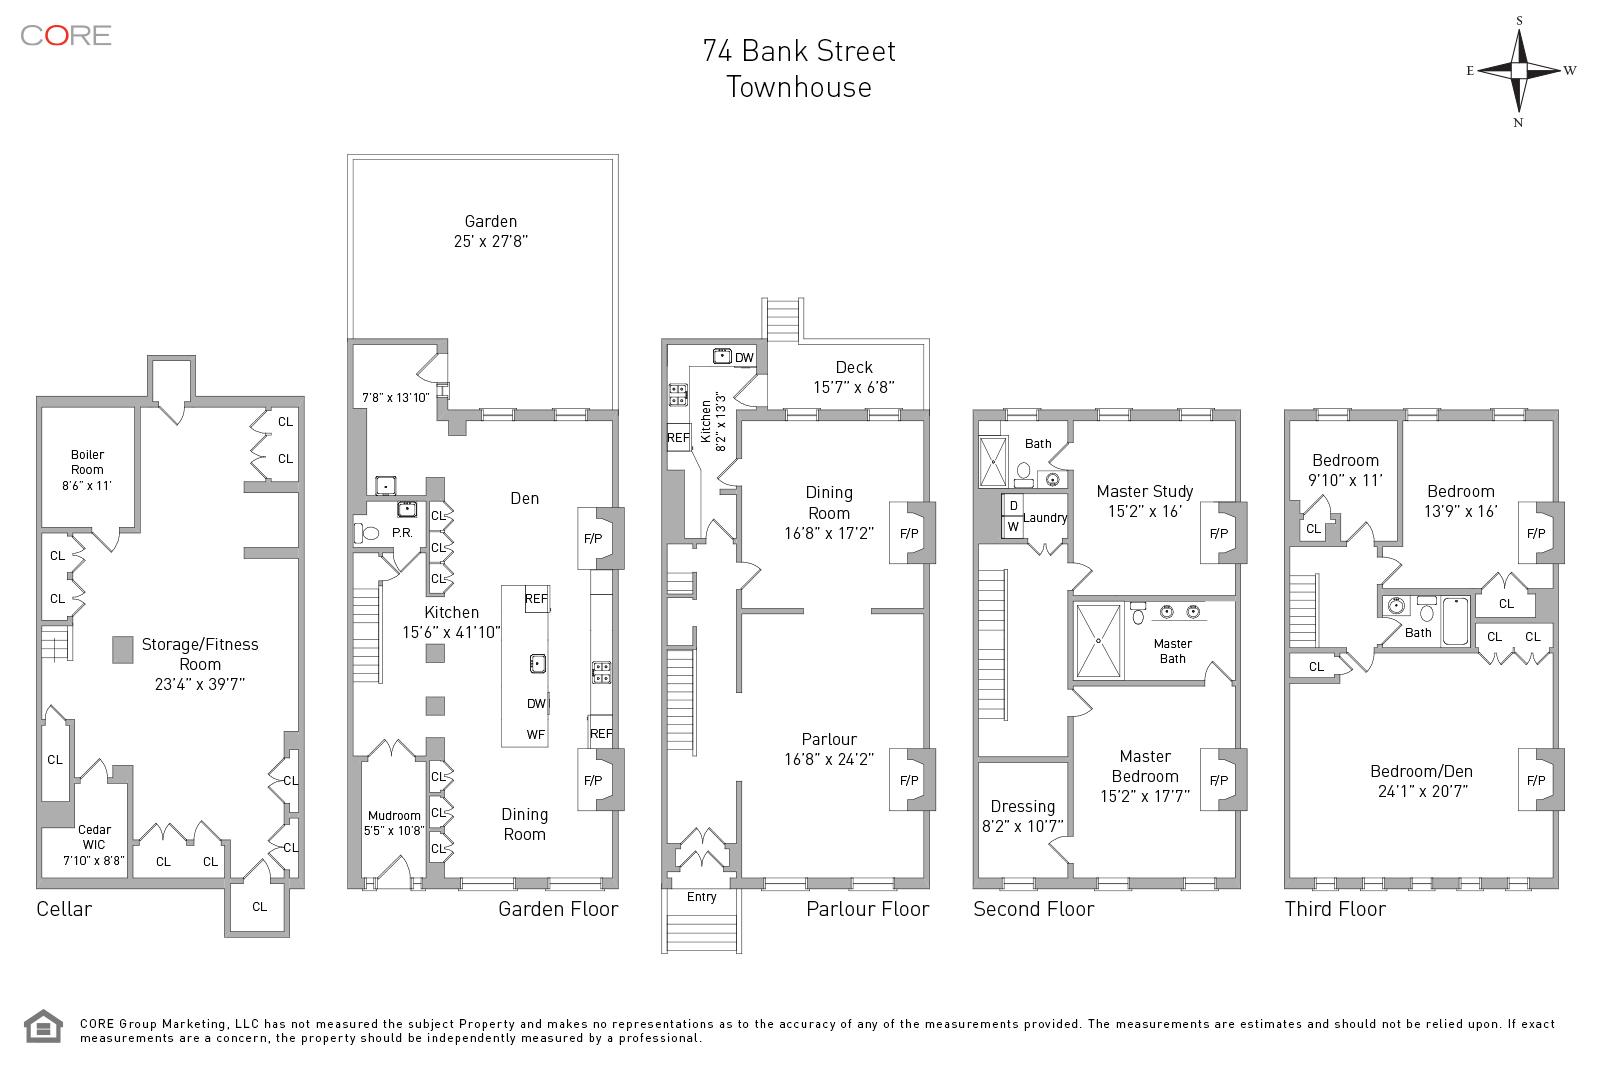 74 Bank St. Building, New York, NY 10014